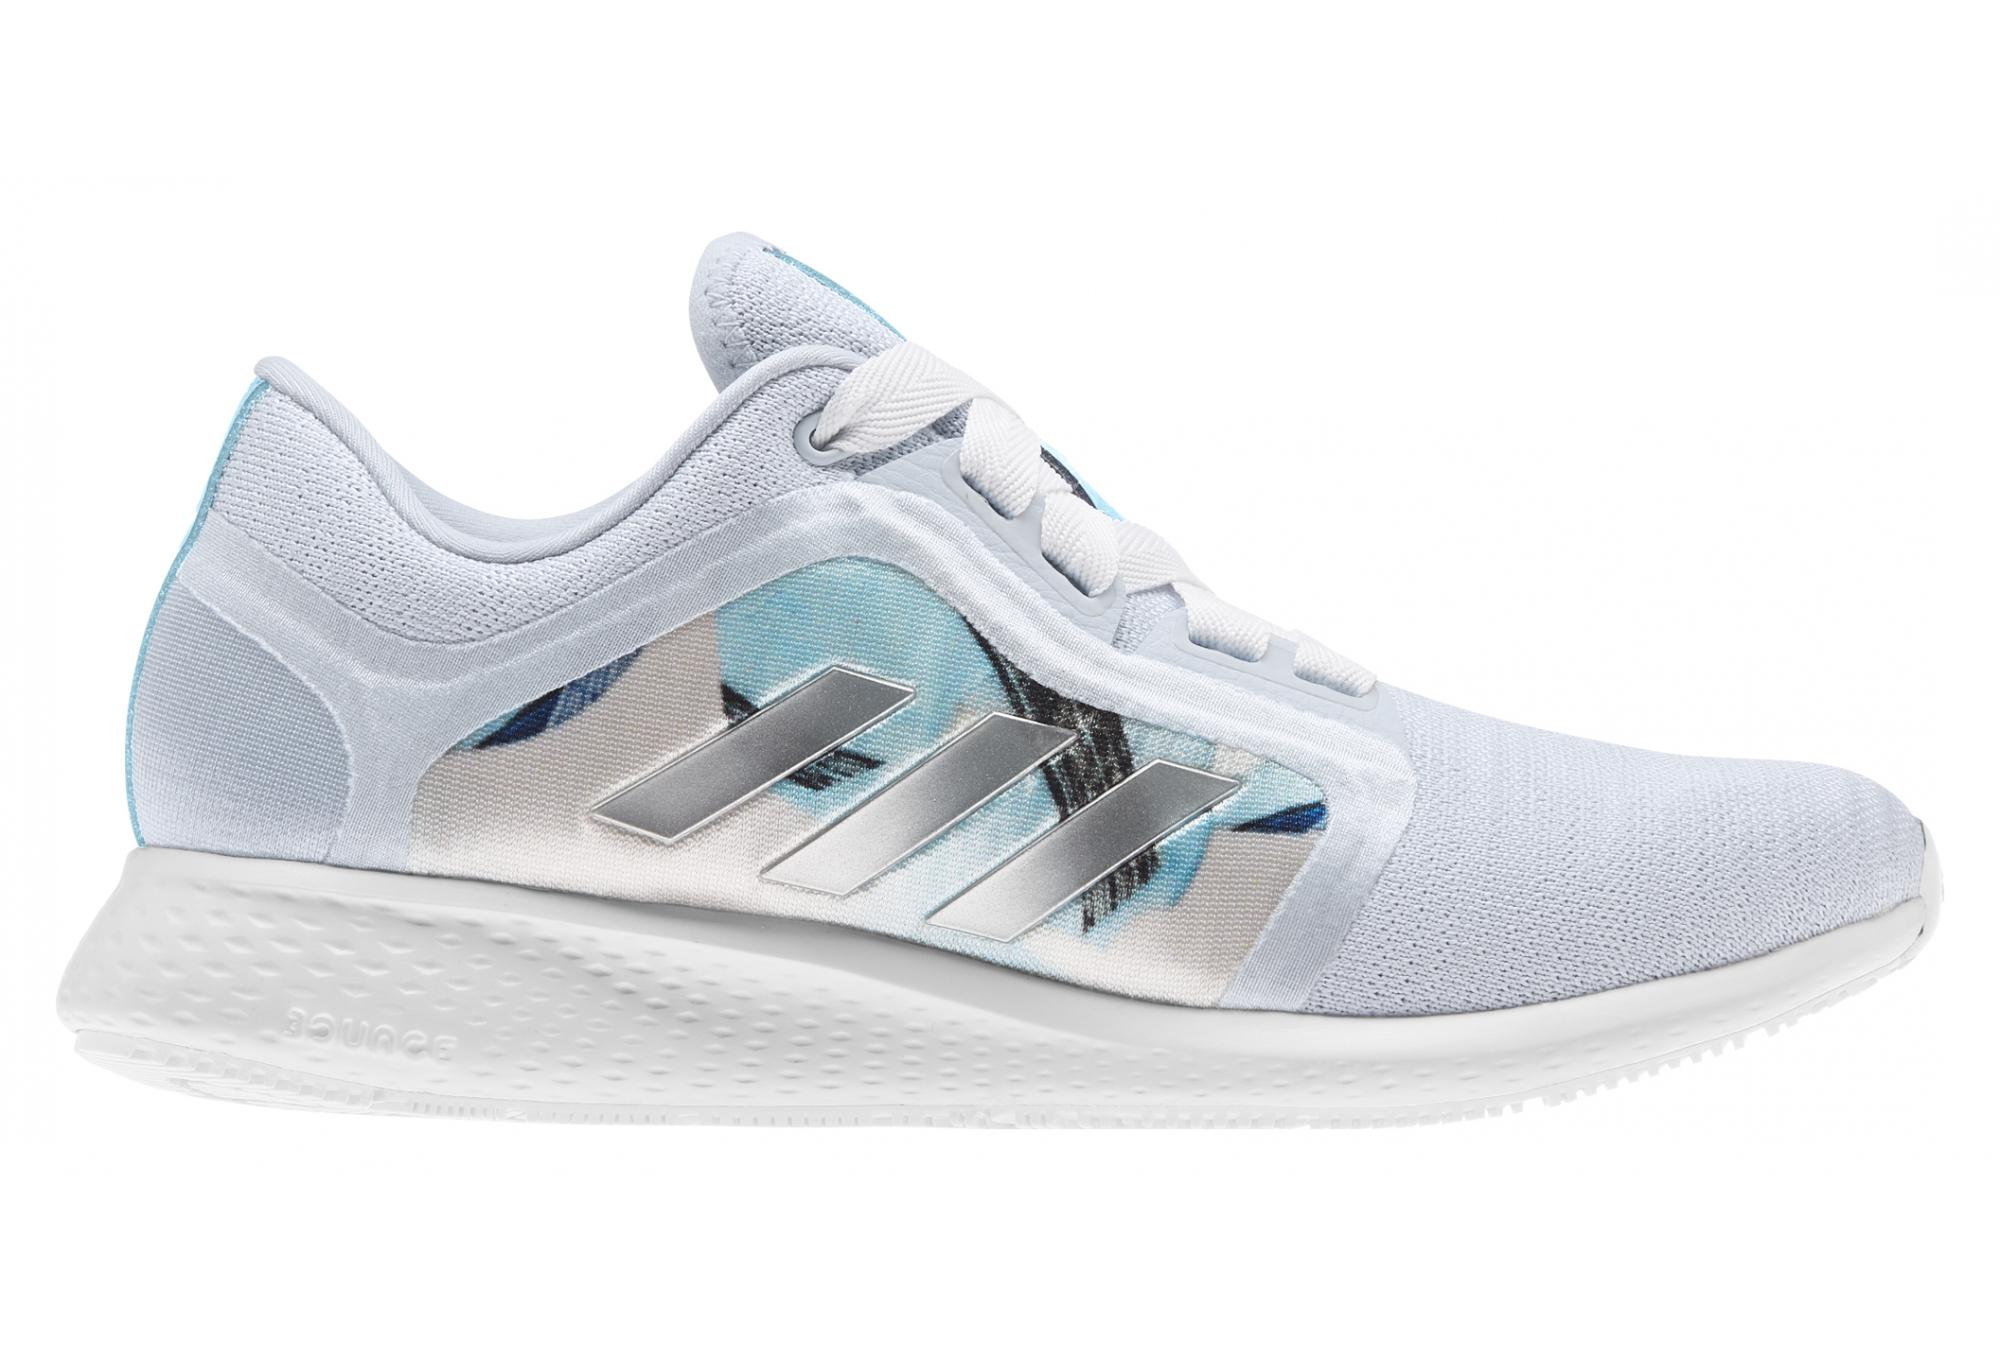 Chaussures femme adidas Edge Lux 4   Alltricks.com